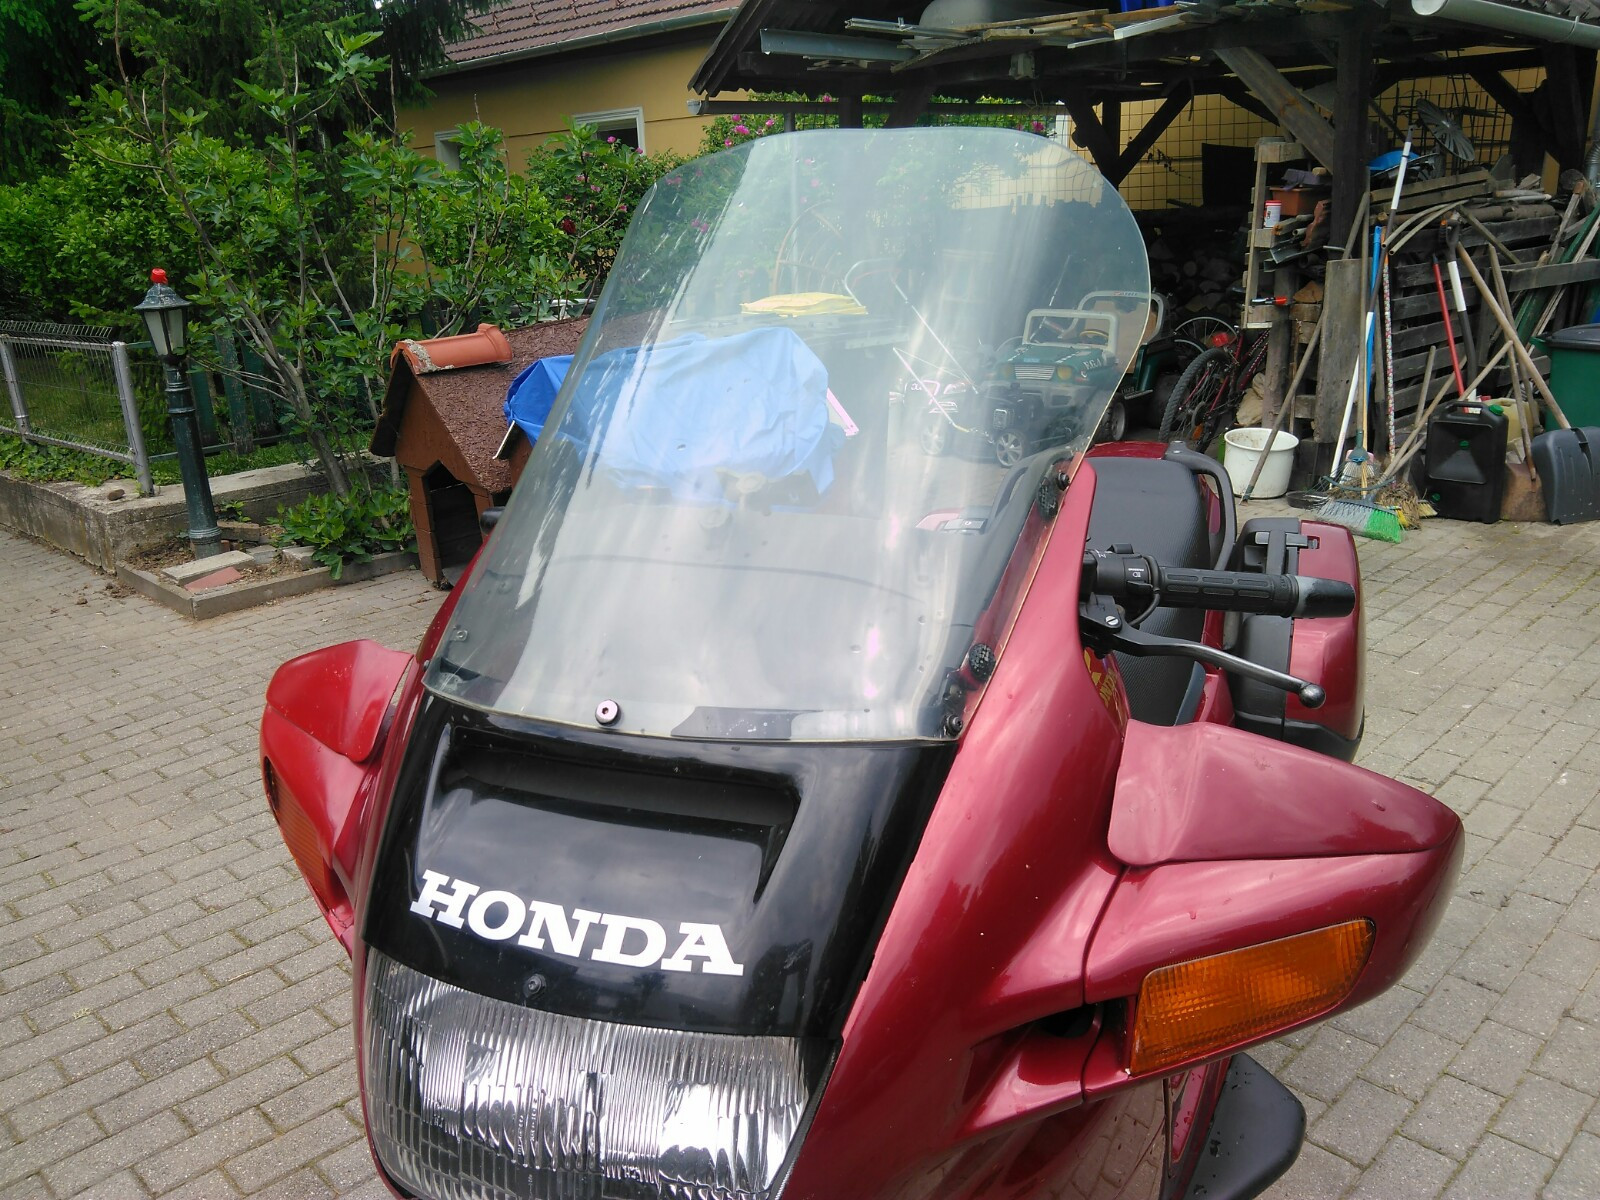 HONDA ST1100R, 8. kép